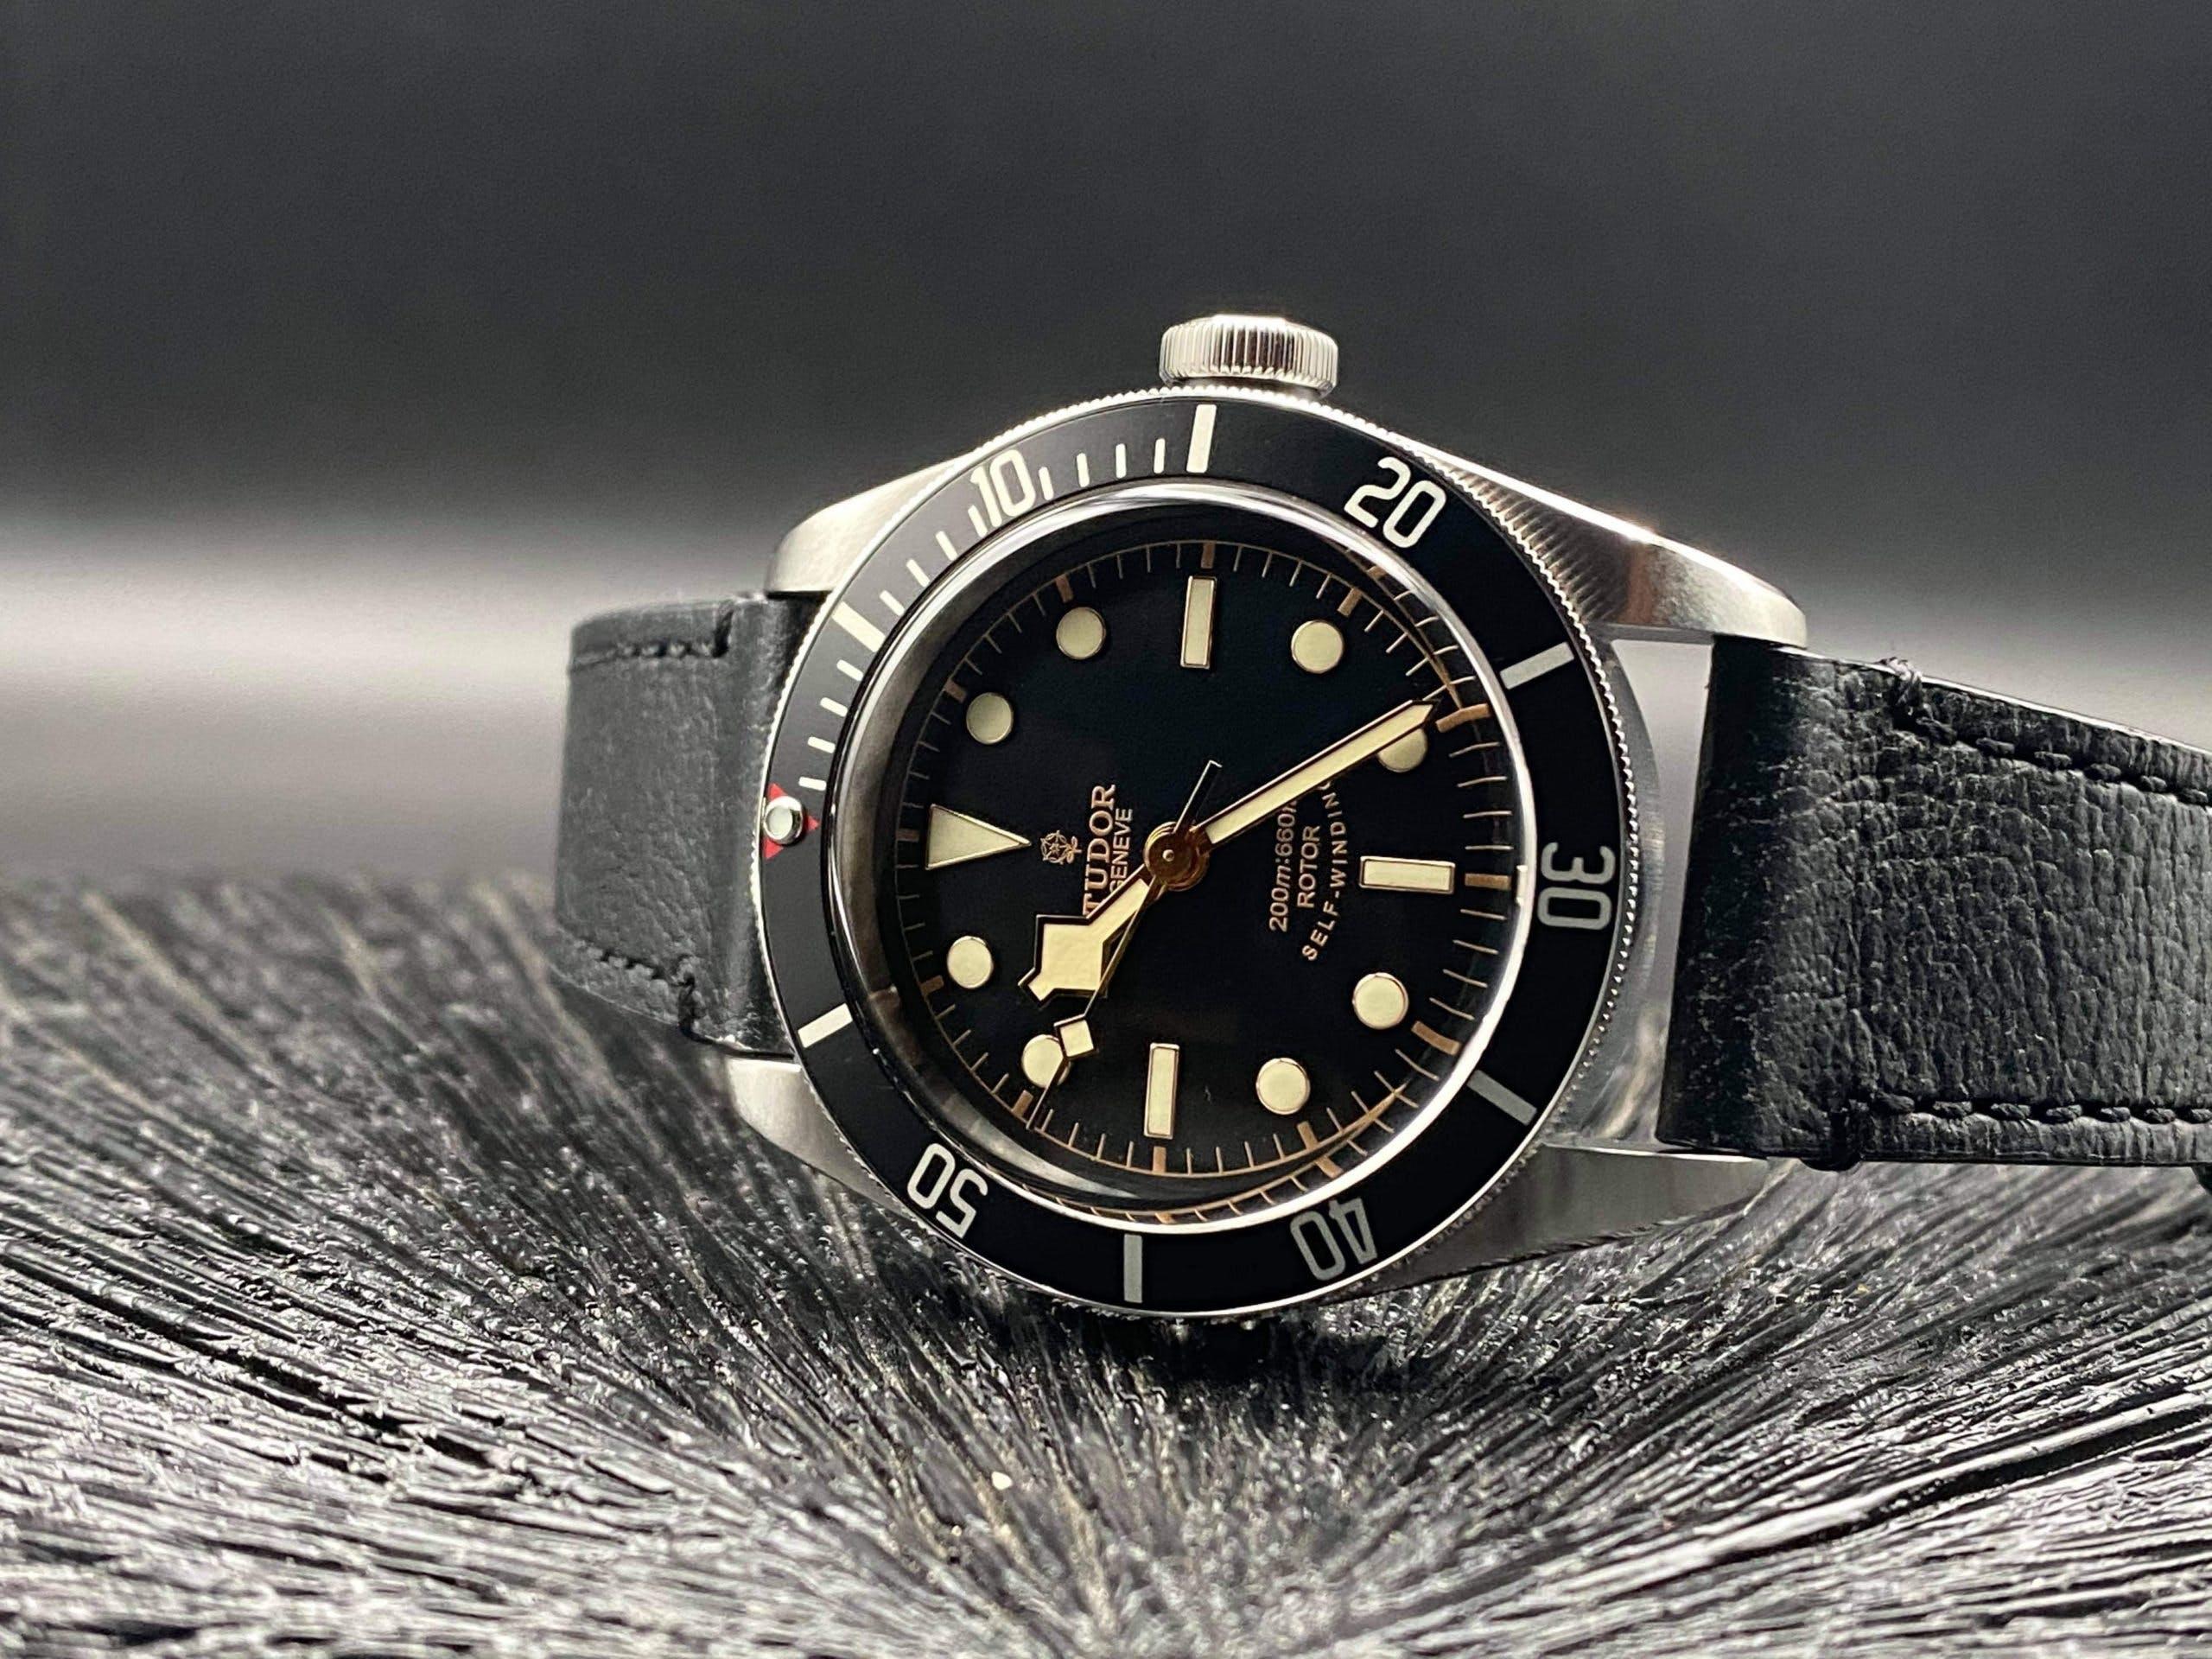 Tudor Black Bay ref. 79220N